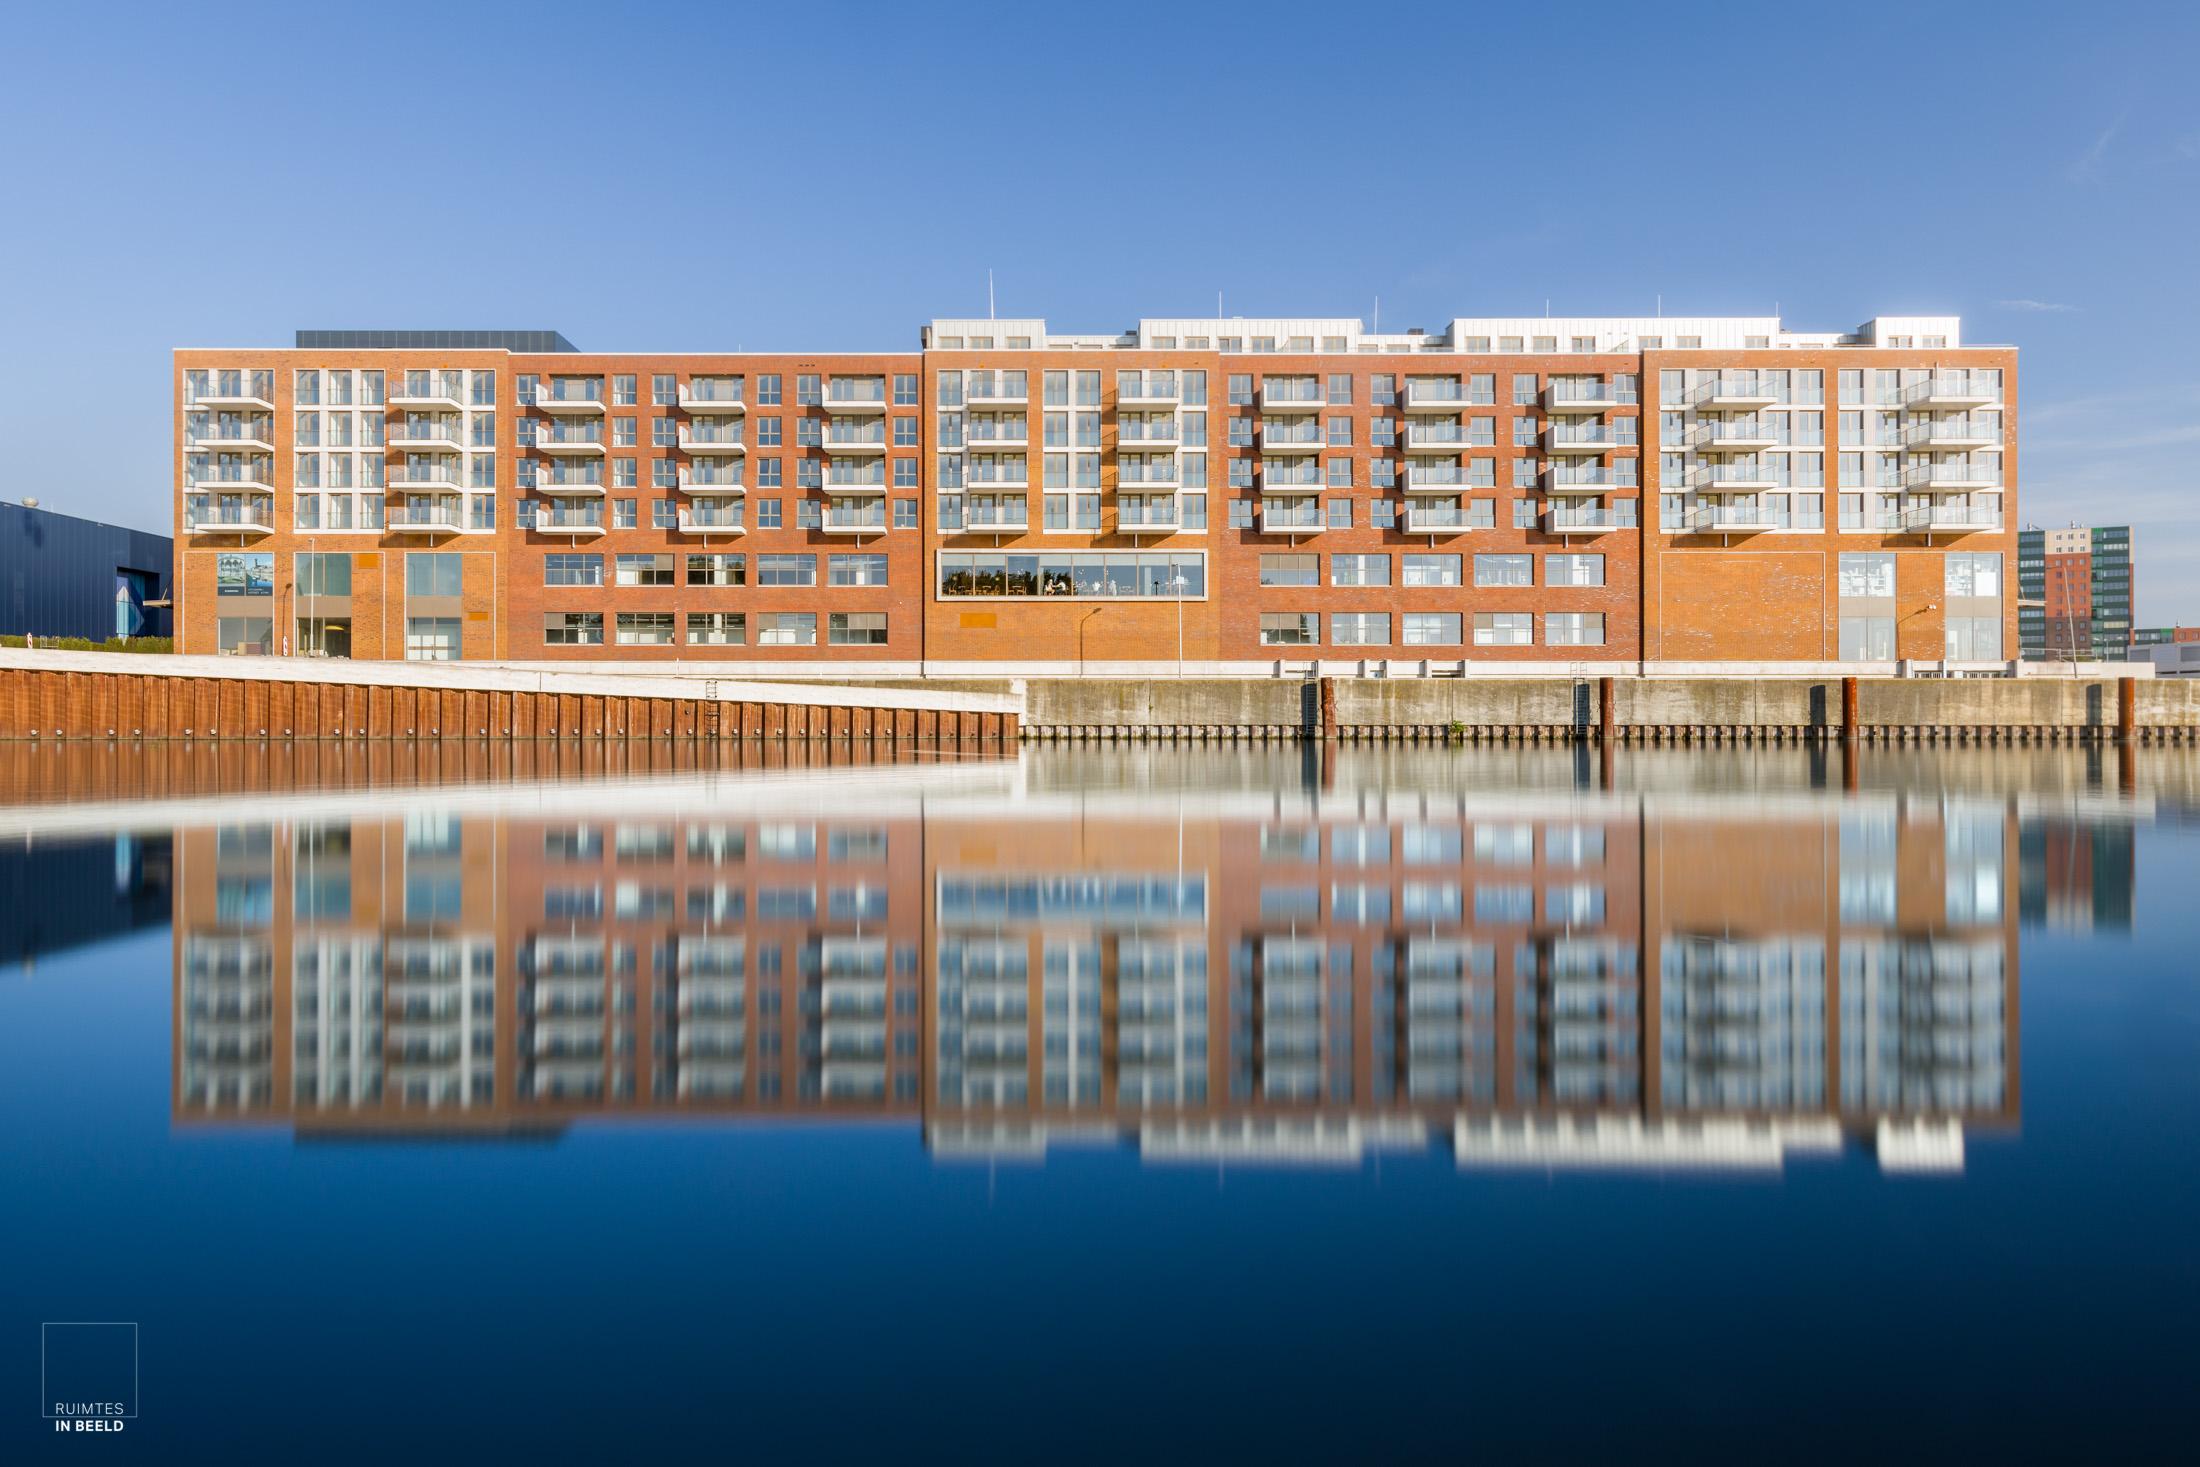 Kernarchitecten, Roermond